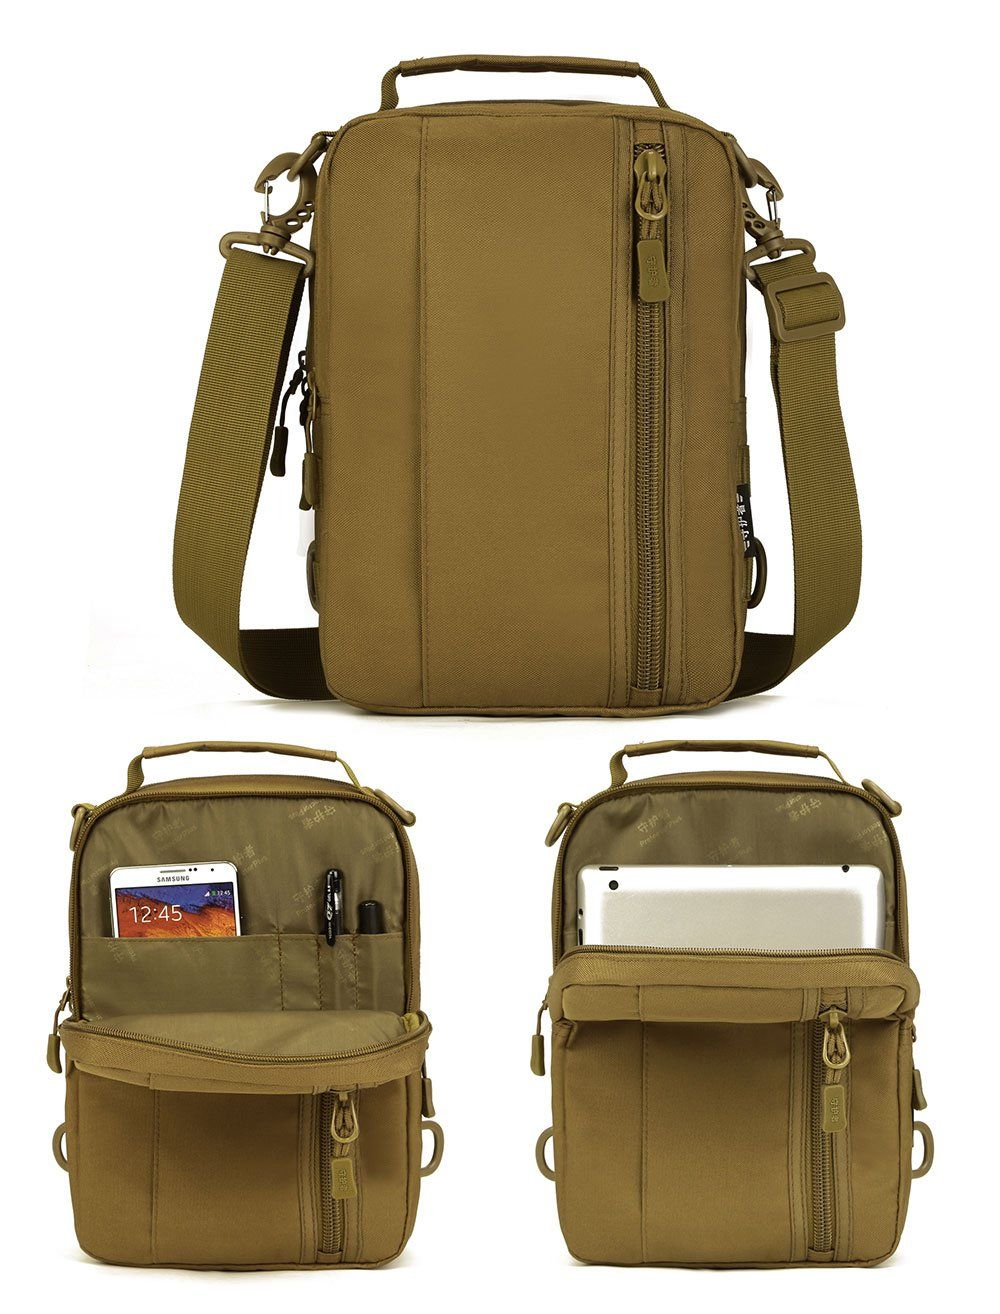 862ab01a9b Military Tactical Multi-Functional MOLLE Messenger Bag Backpack Crossbody Shoulder  Bag Handbag Fits 10